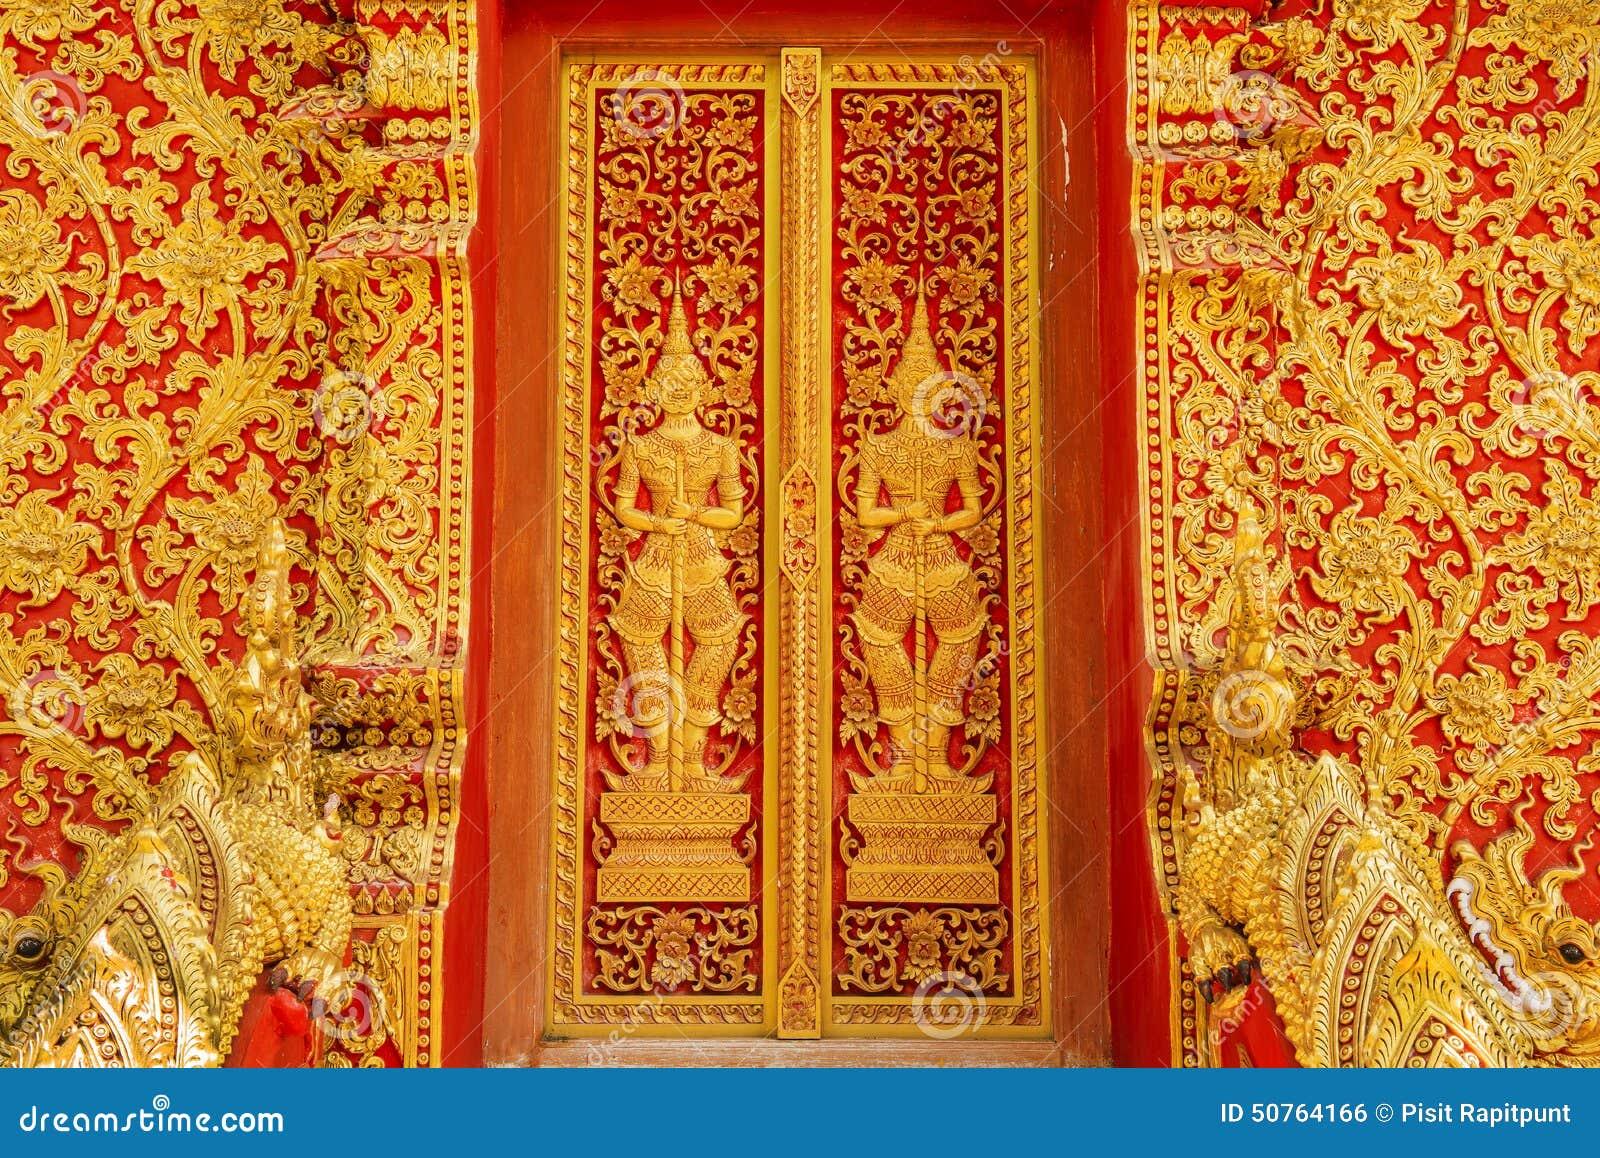 Art door carving guardian giant in the temple thailand